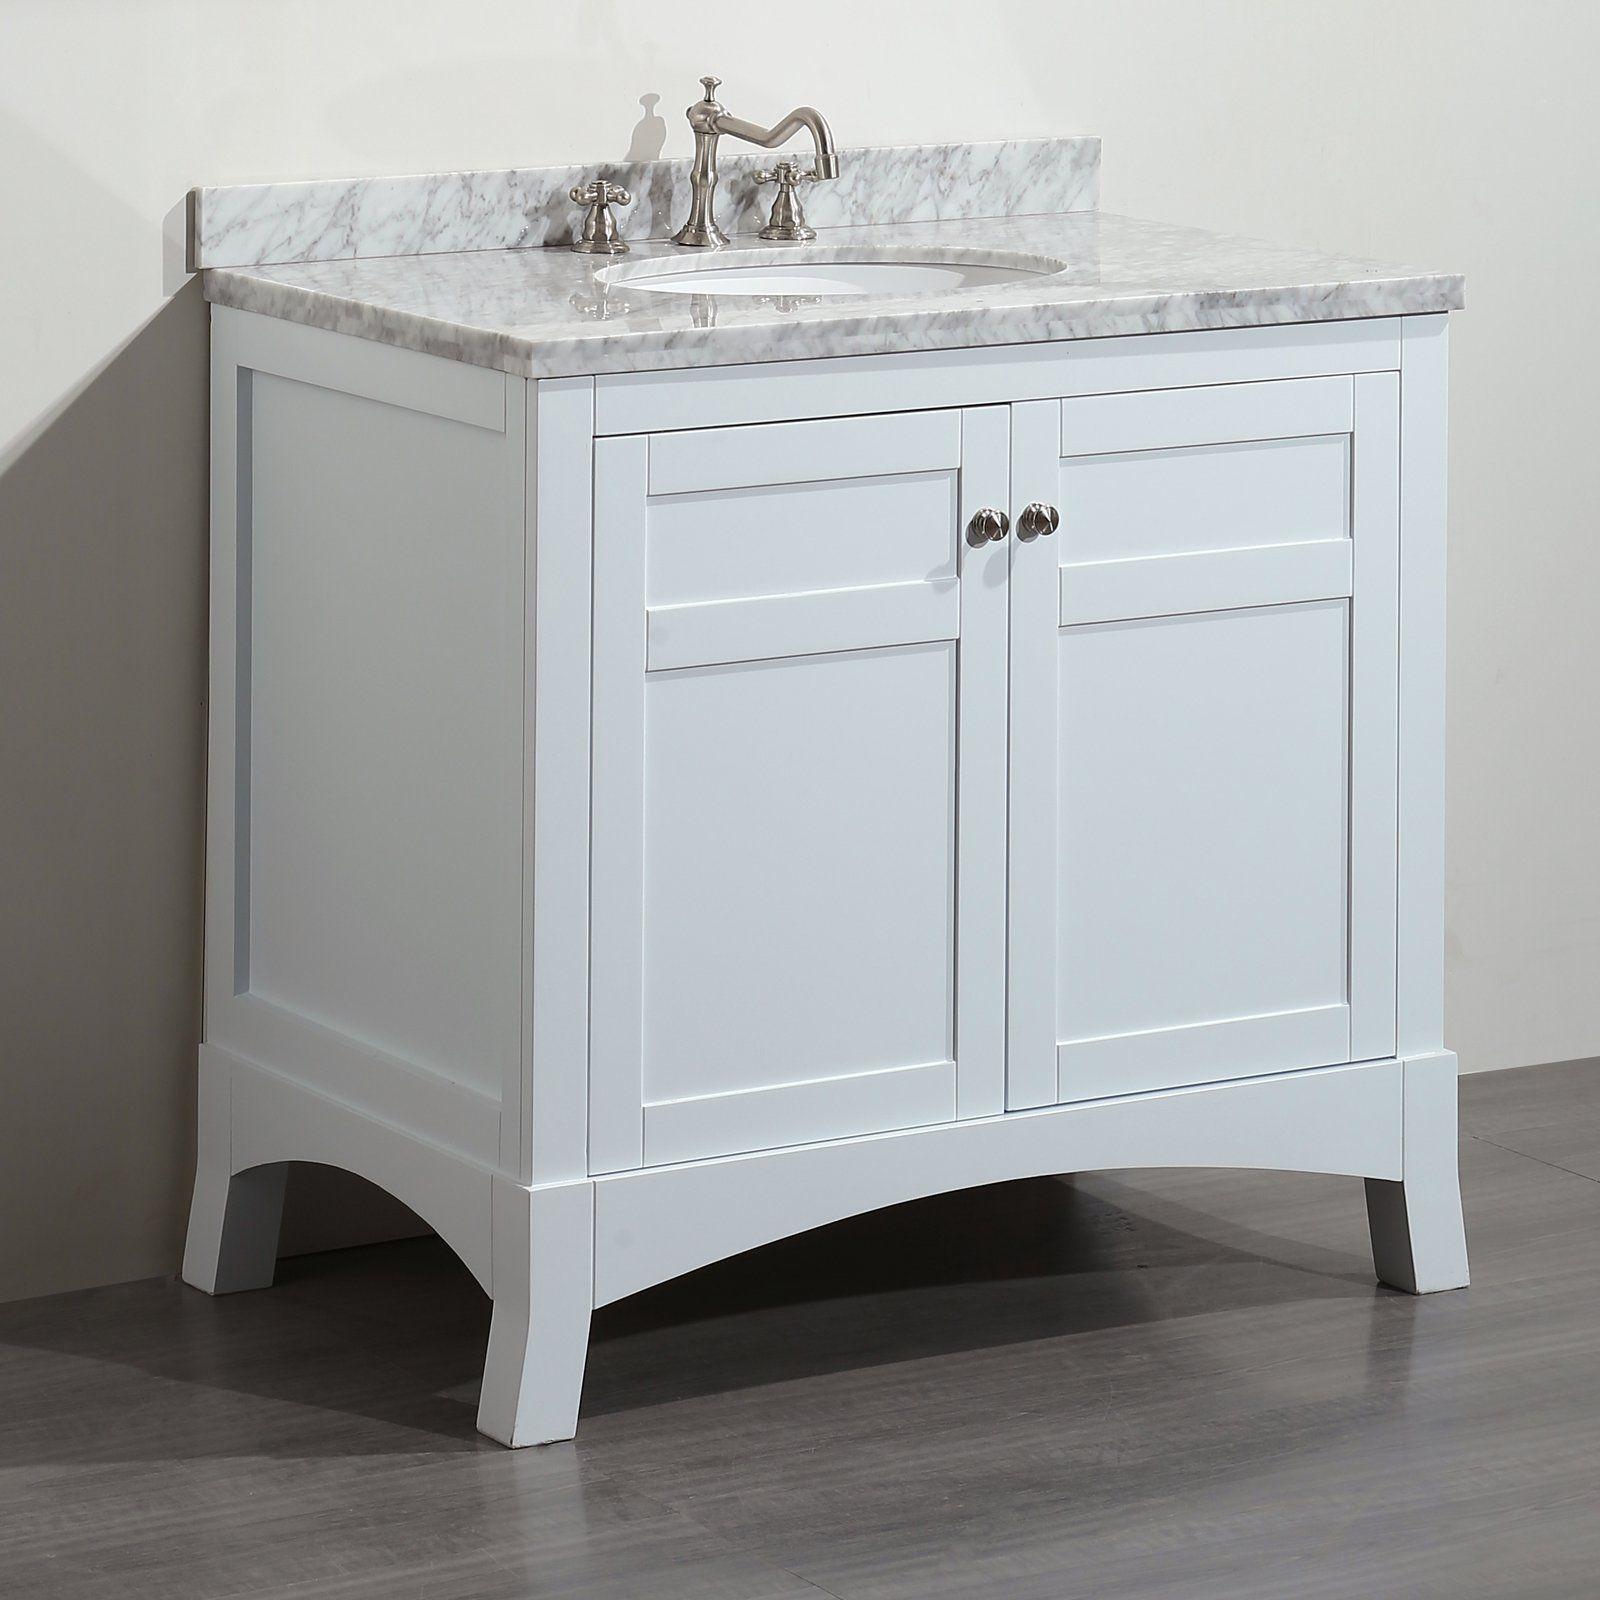 Eviva New York 36sgle Sk Bathroom Vanity Set from